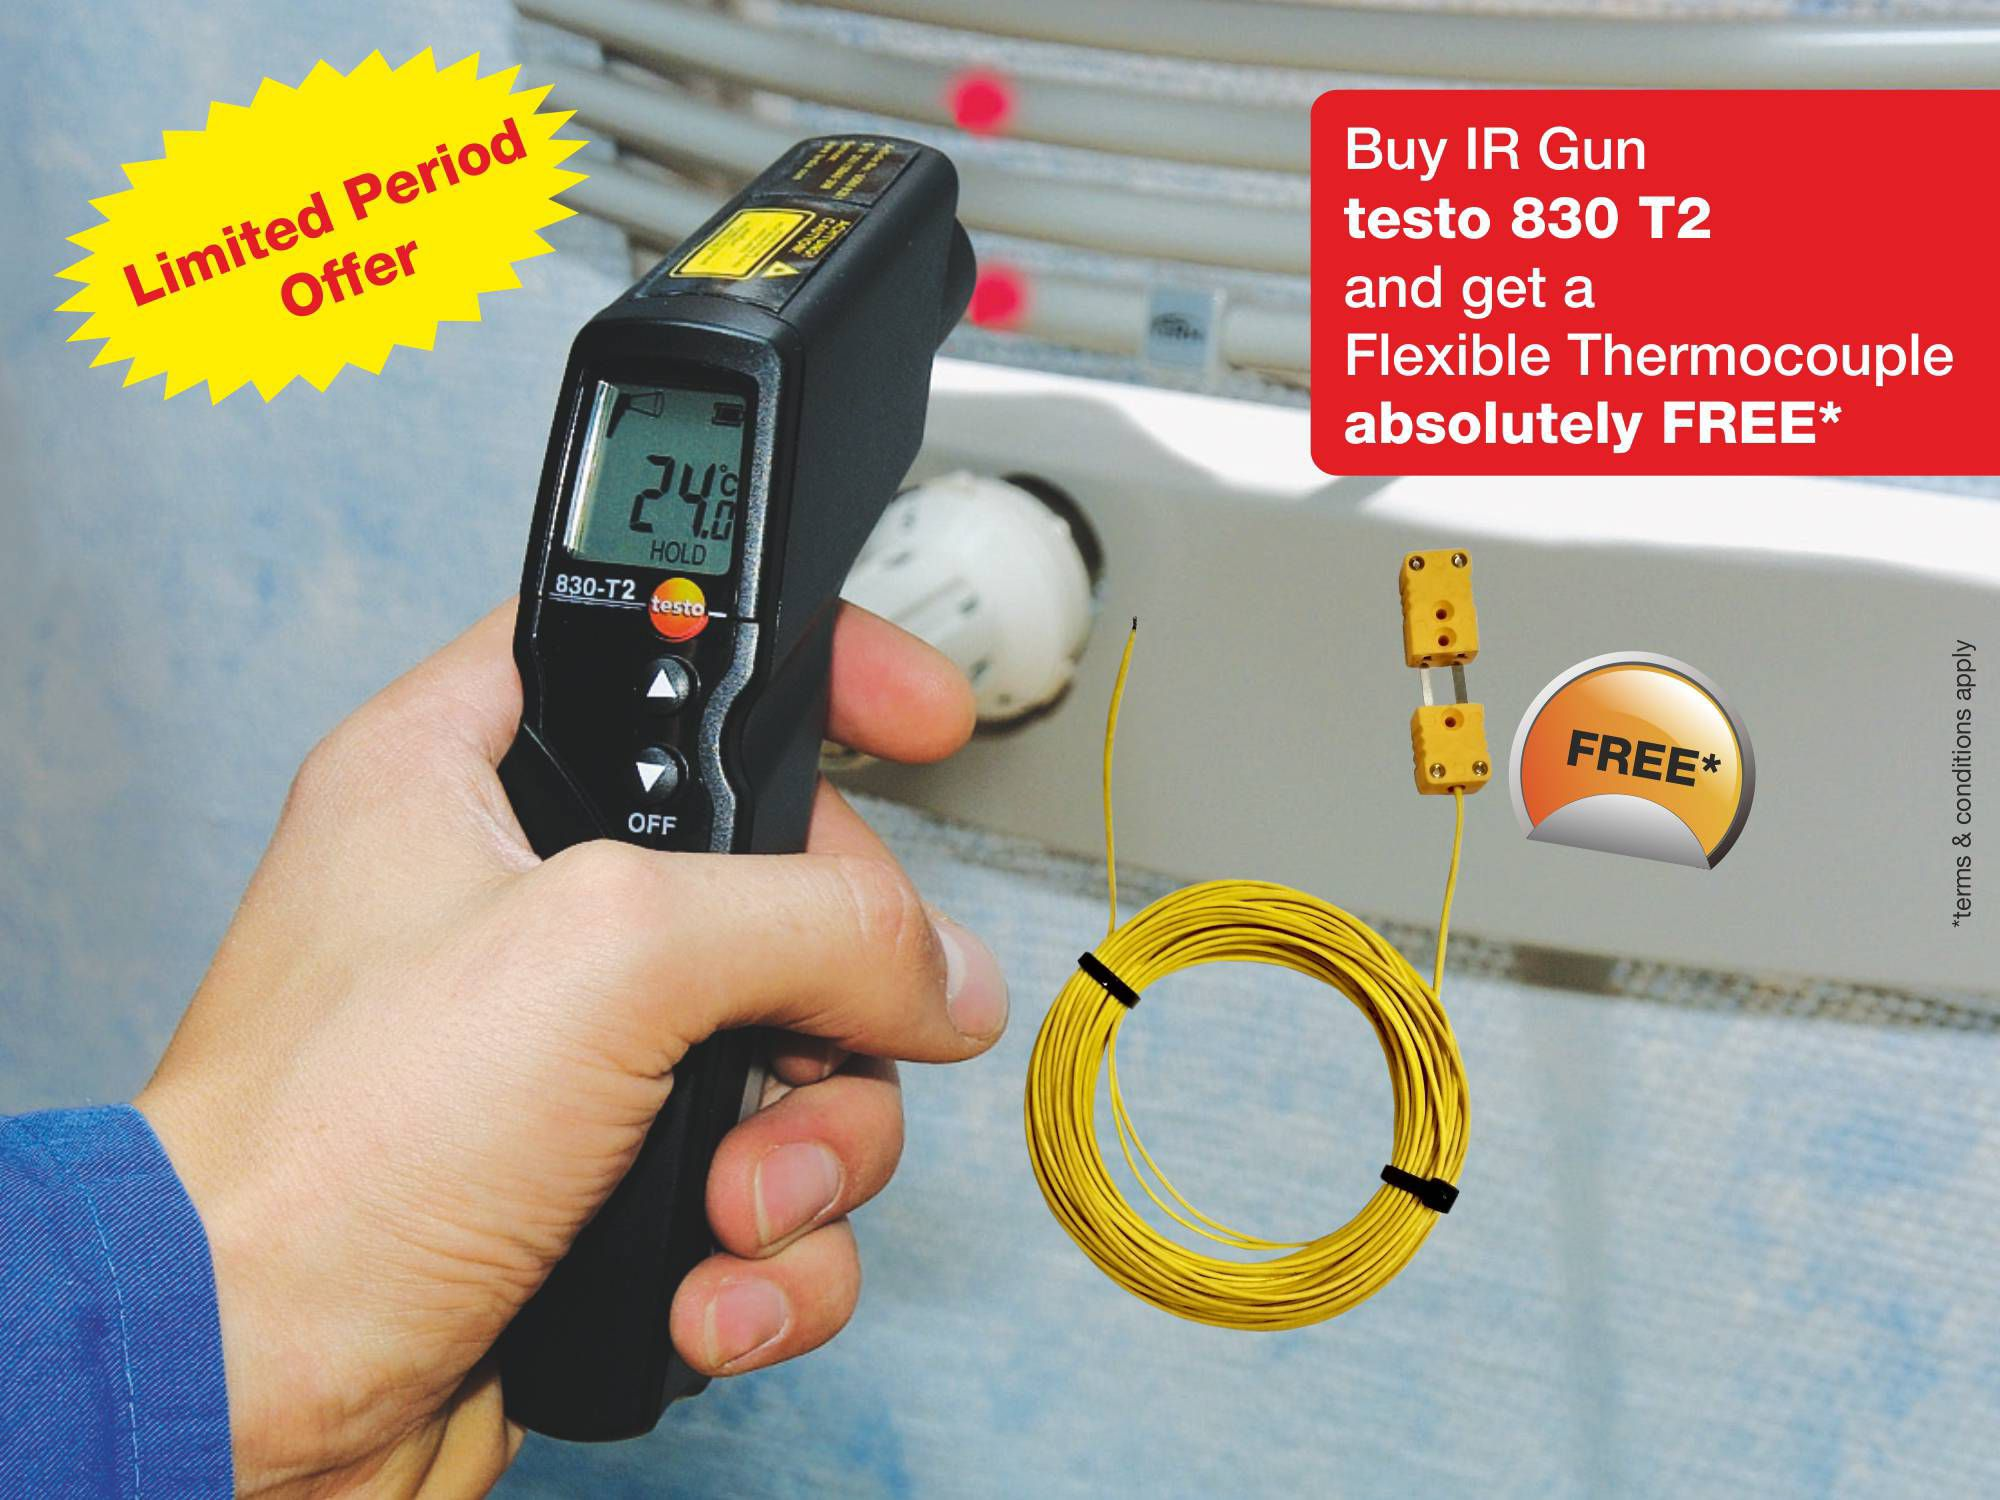 testo-830T2-offer_IN.jpg